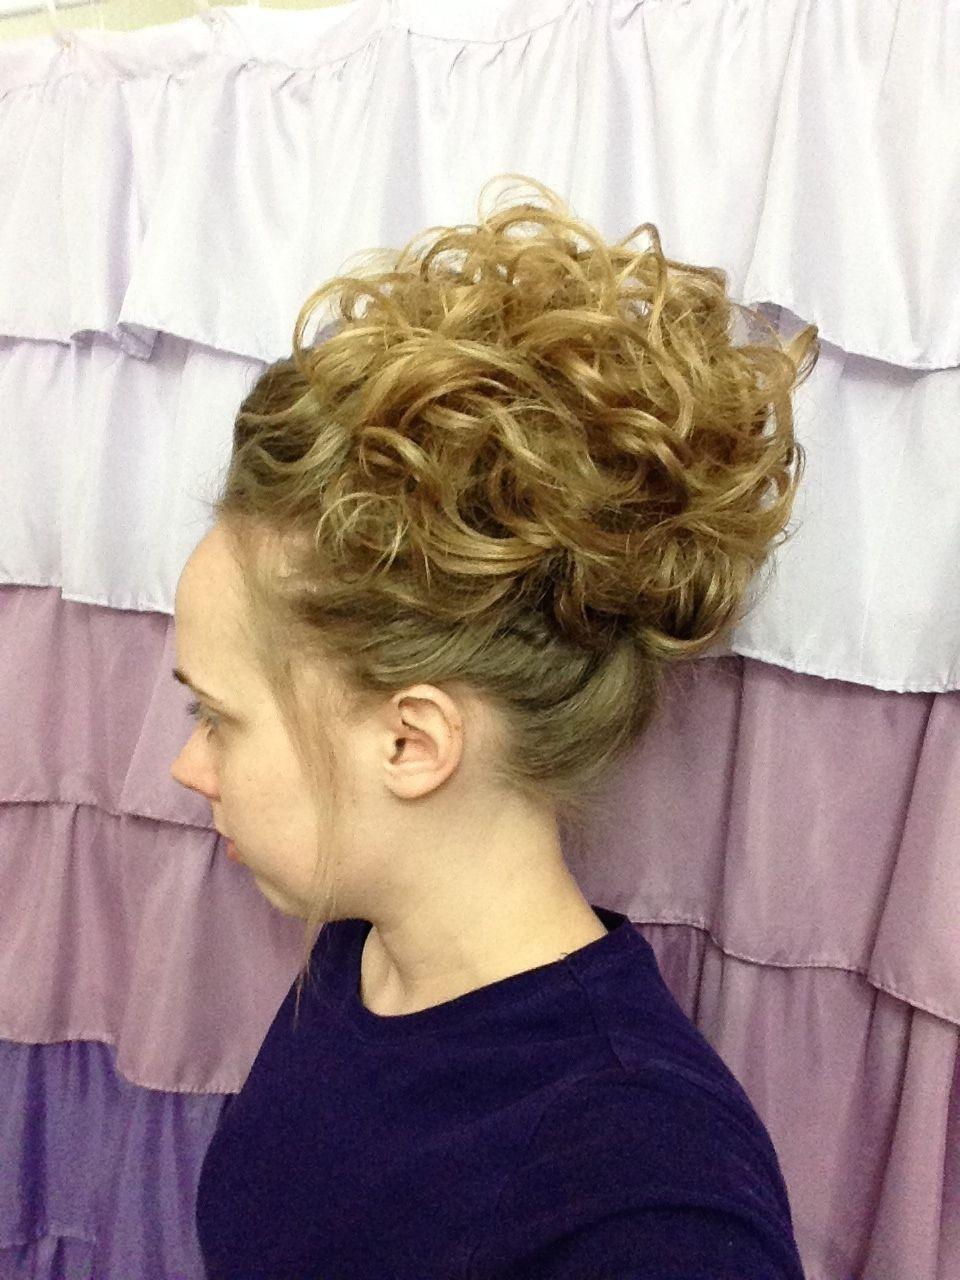 Pentecostal Hair Curly Updo Pentecostal Hairstyles Curly Hair Styles Hair Styles